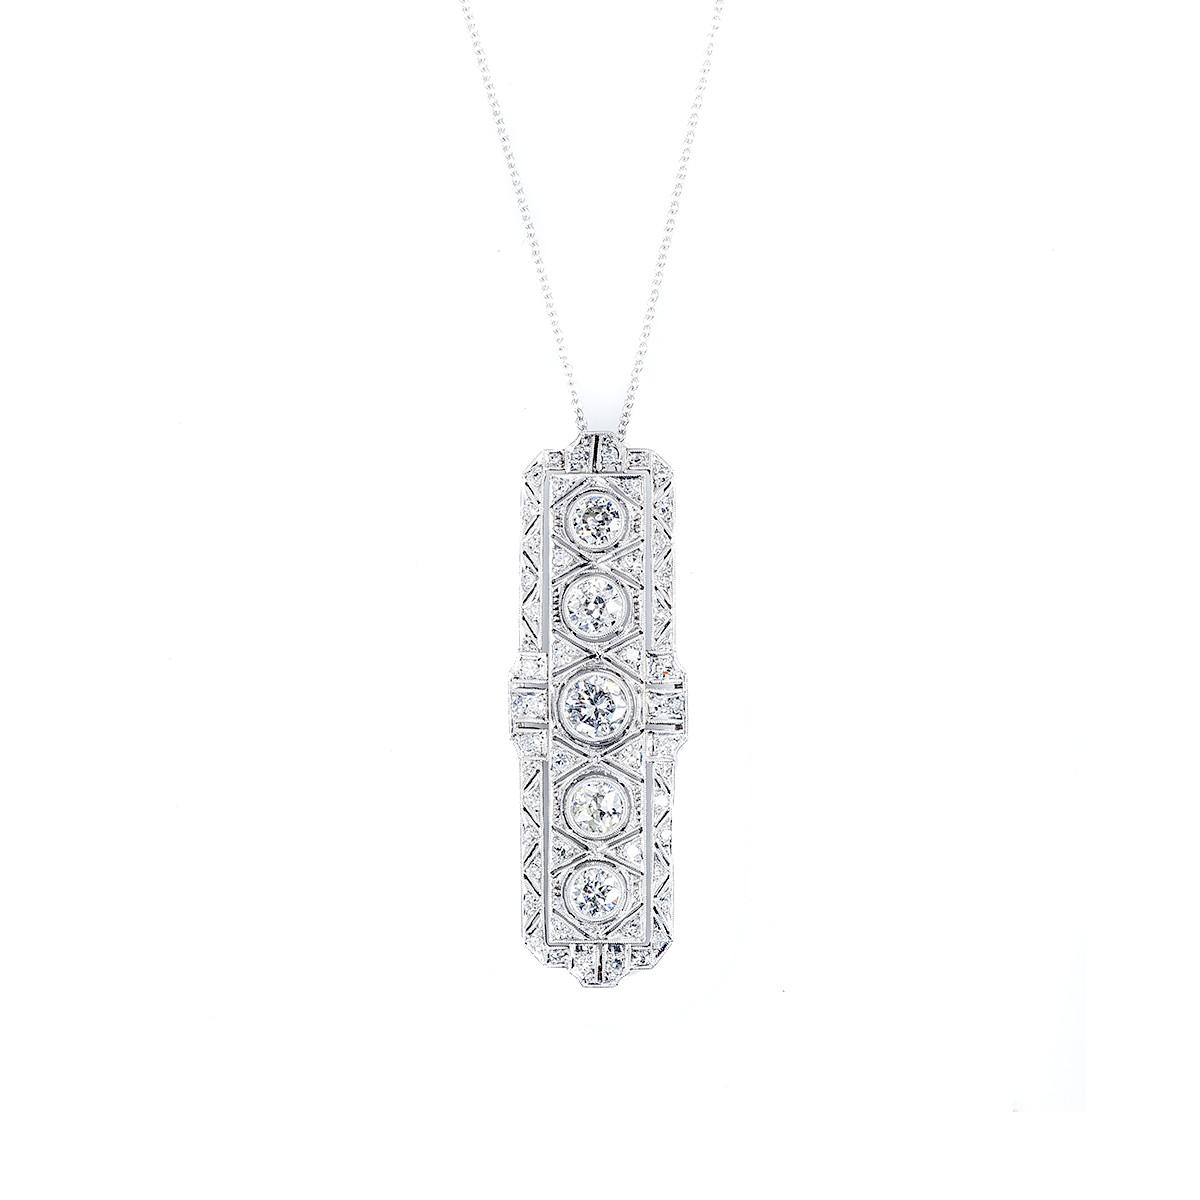 Antique Art Deco 2.50 CTW Diamond Necklace